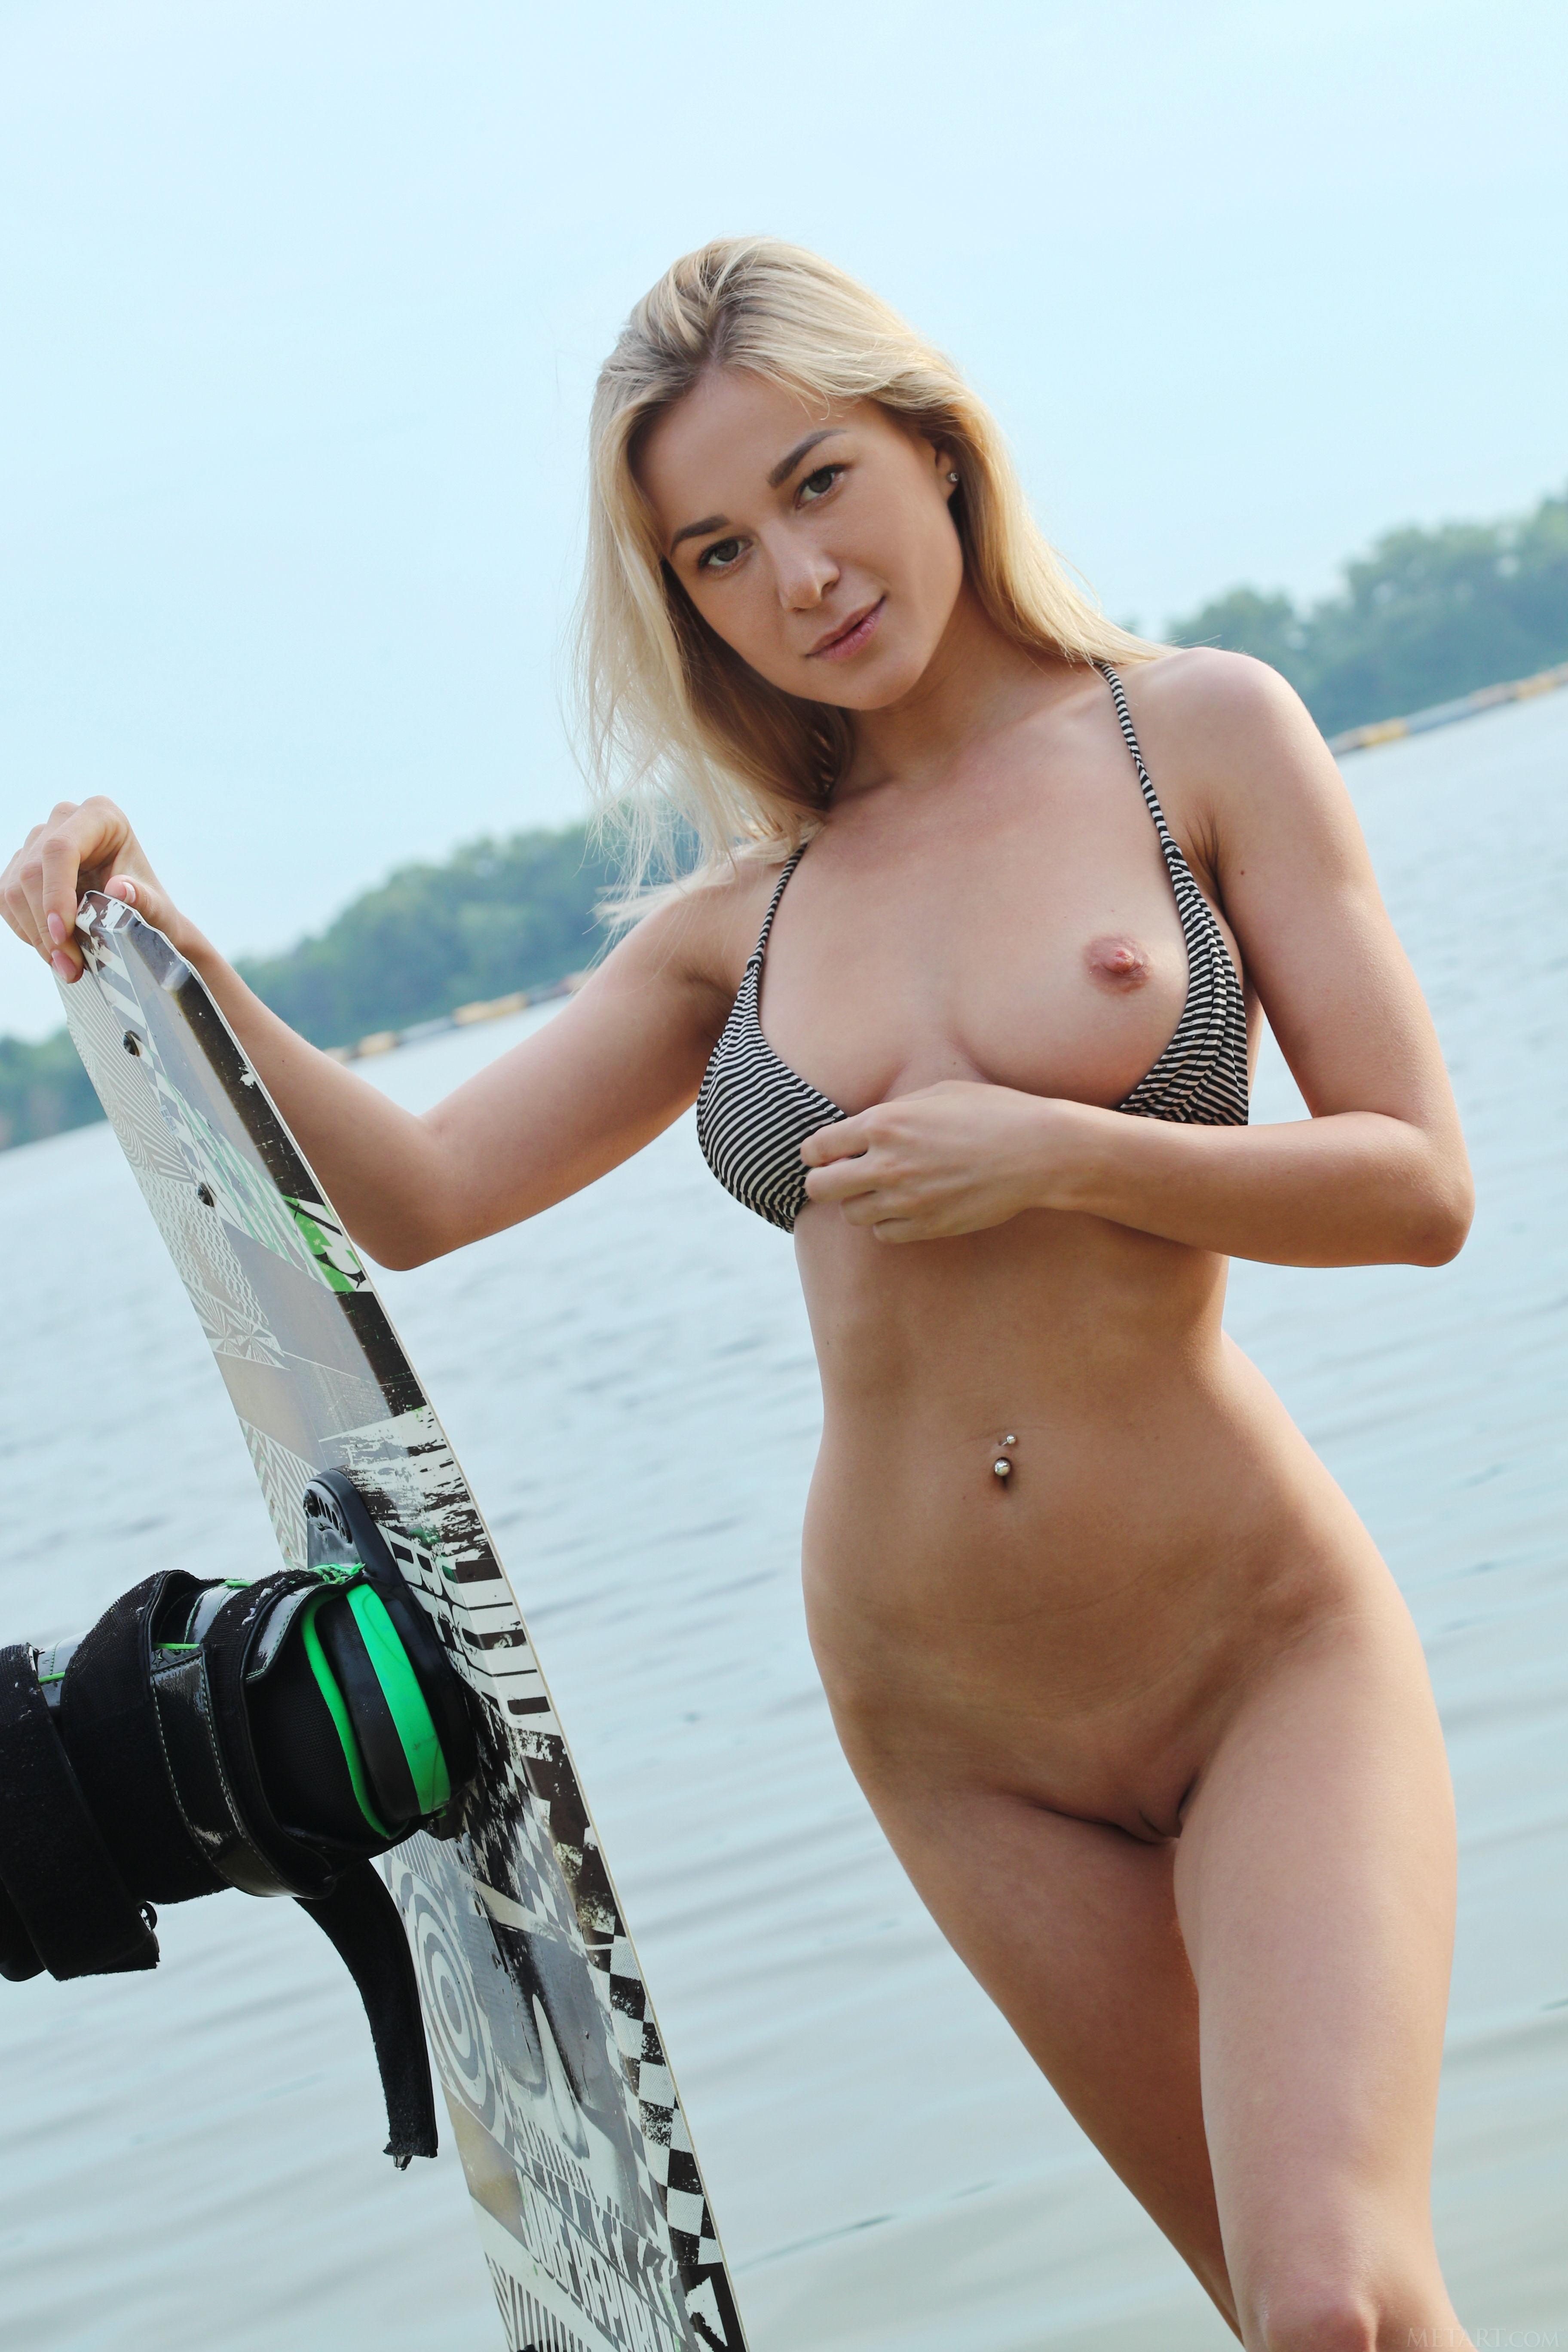 [Image: Met-Art-Water-Sport-Candice-B-high-0010.jpg]